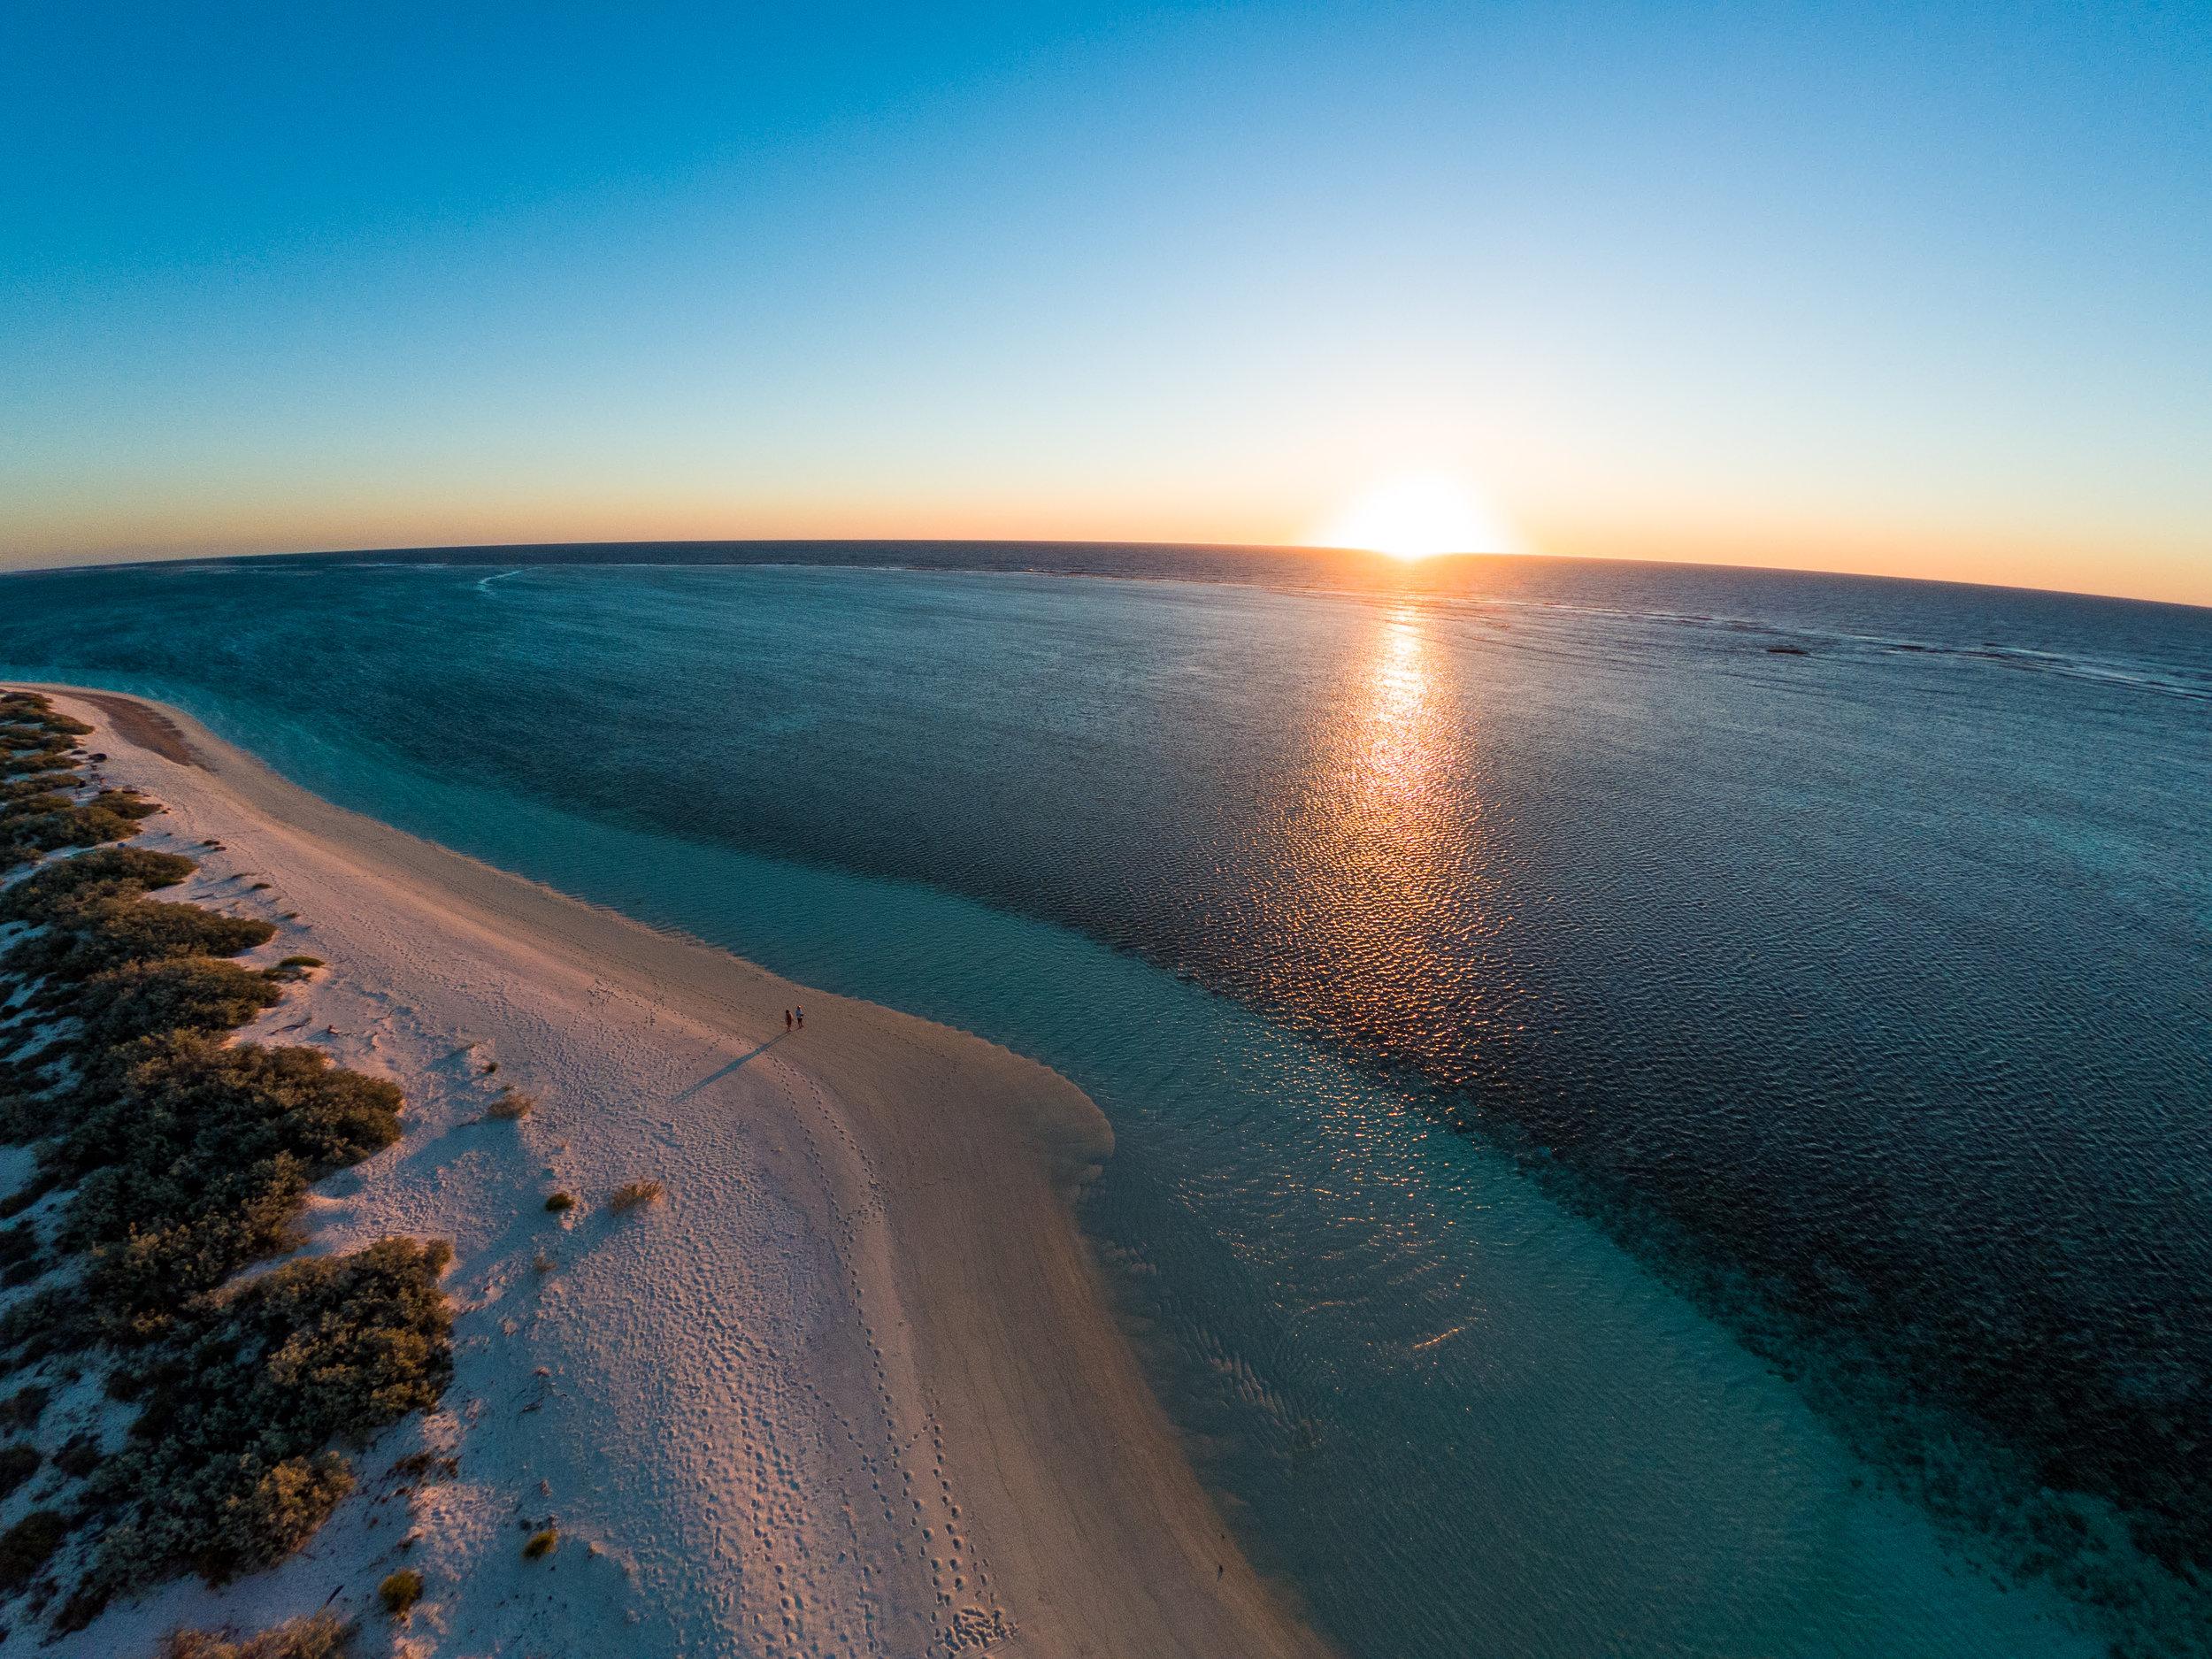 Sal_Salas_Drone_Sunset  (1 of 7).JPG